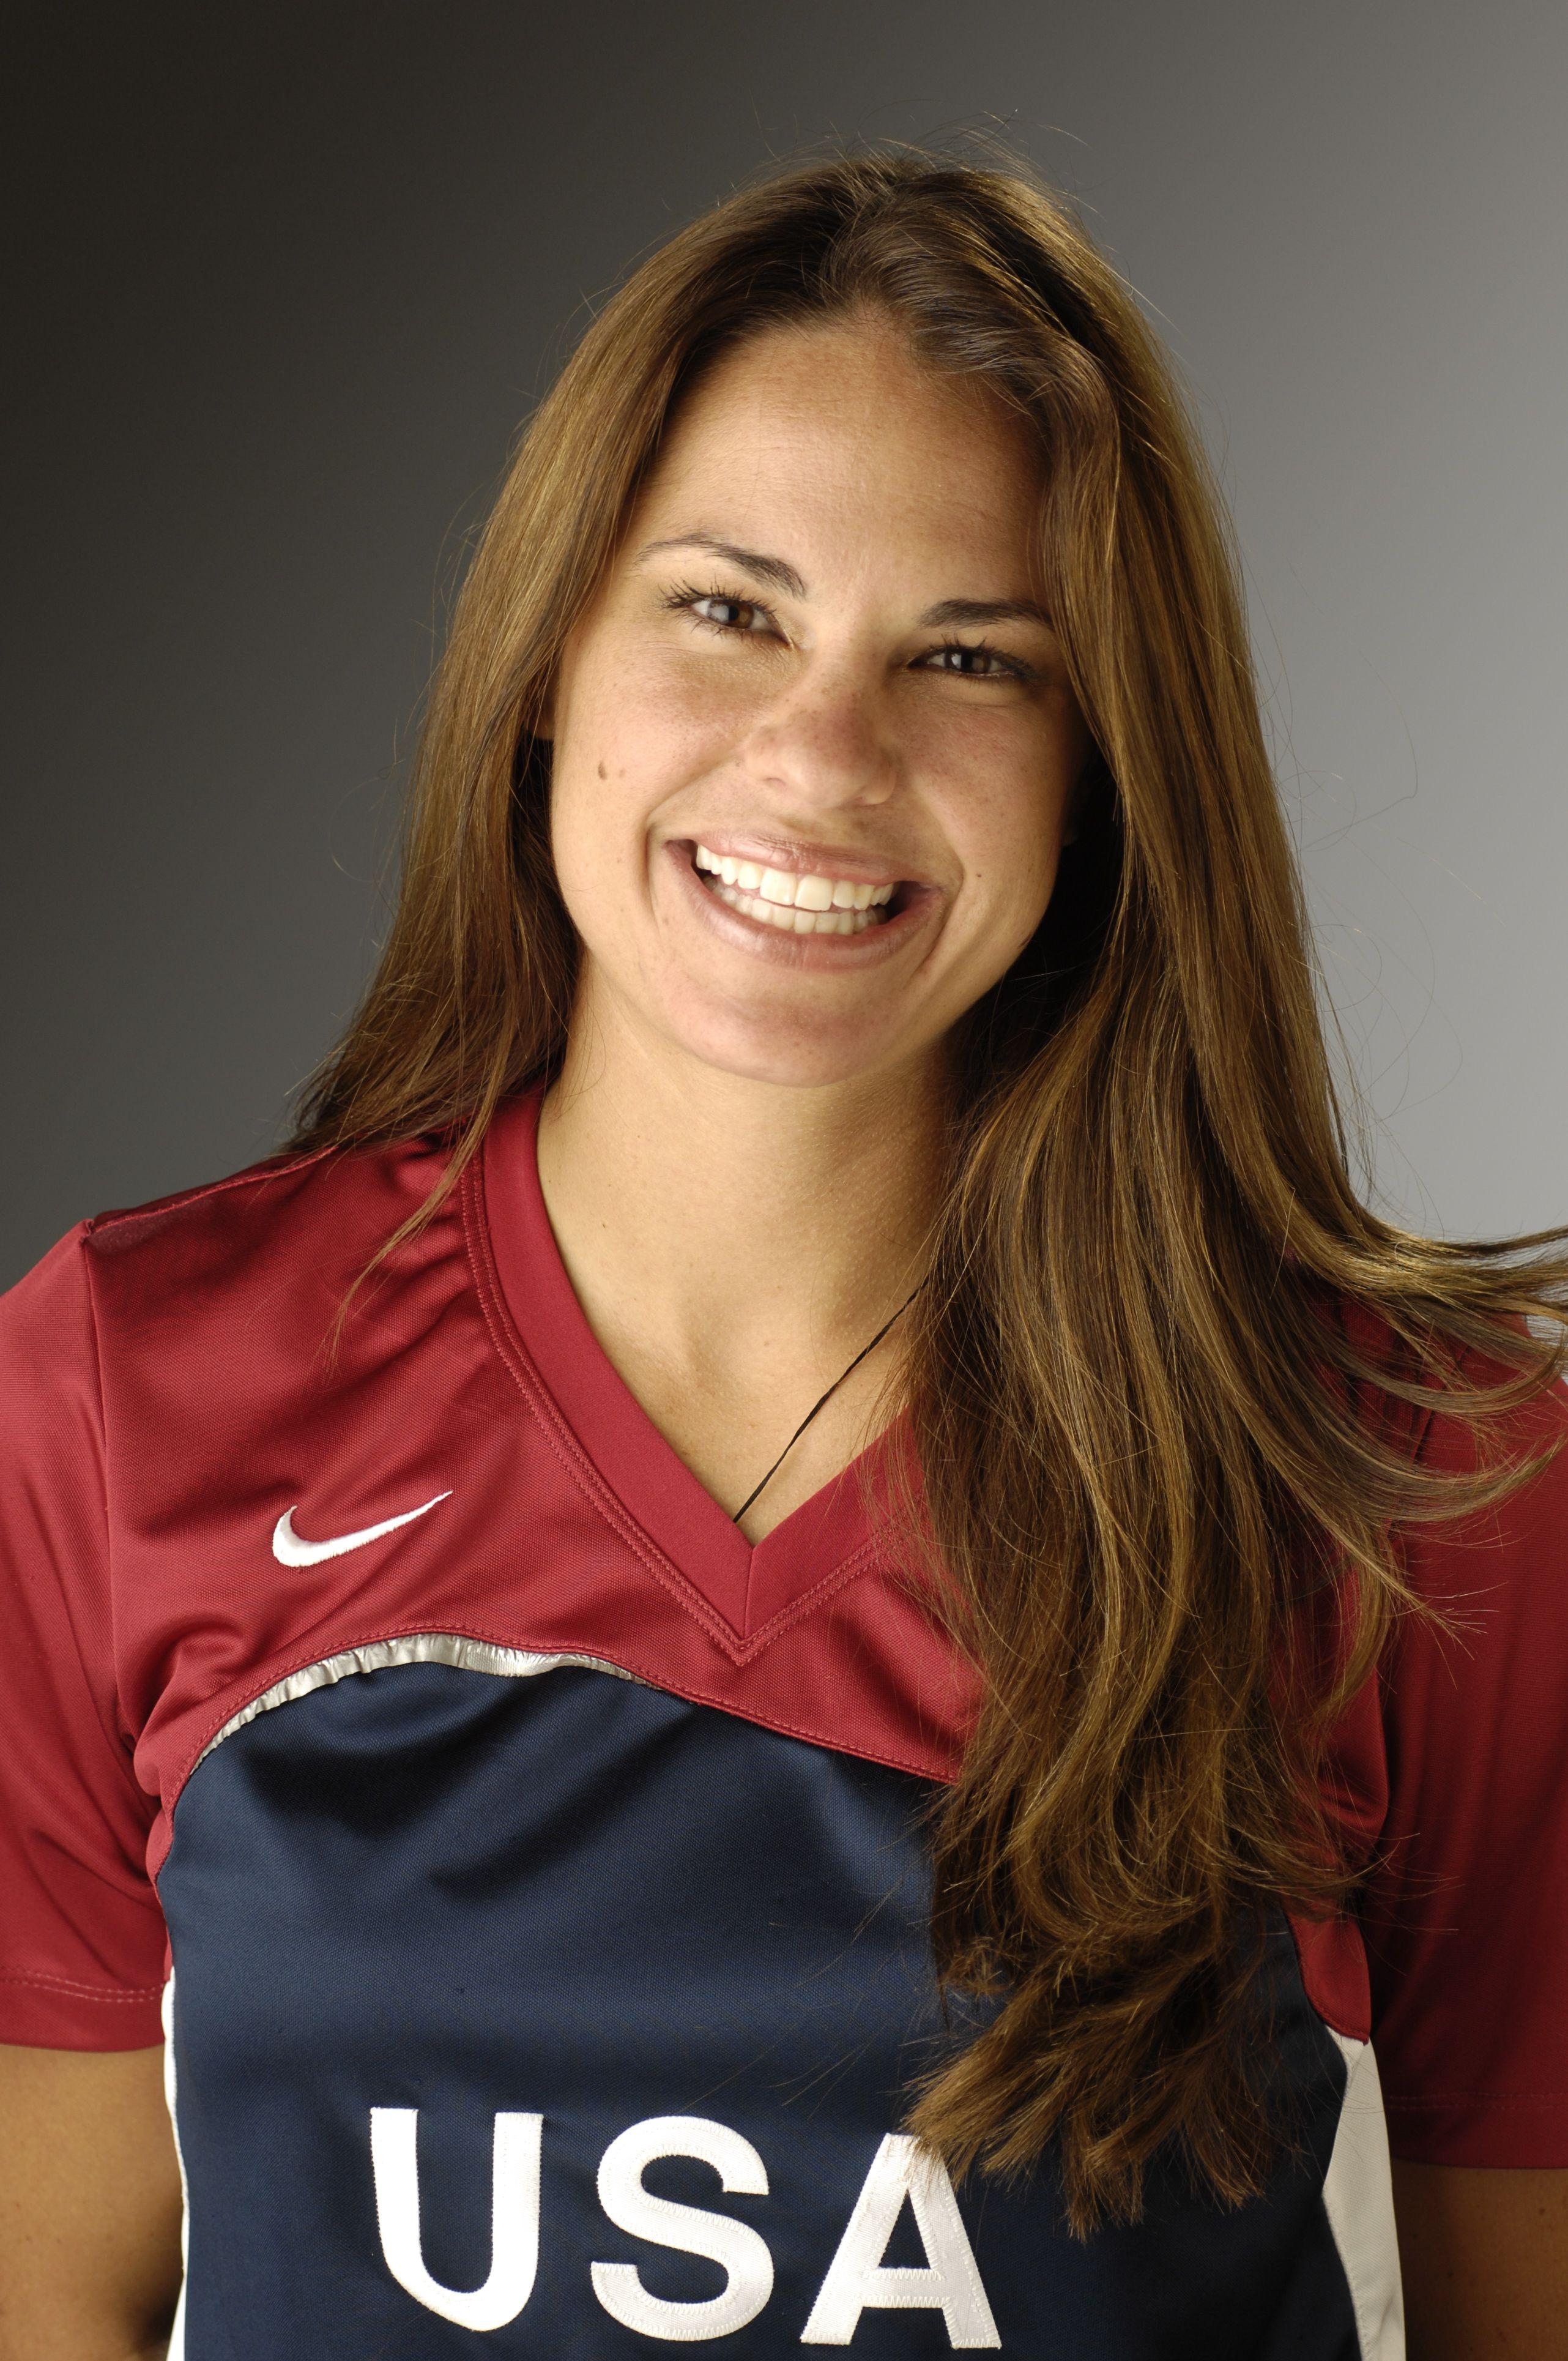 Jessica Mendoza Softball Bing Images Jessica Mendoza Female Athletes Sport Girl